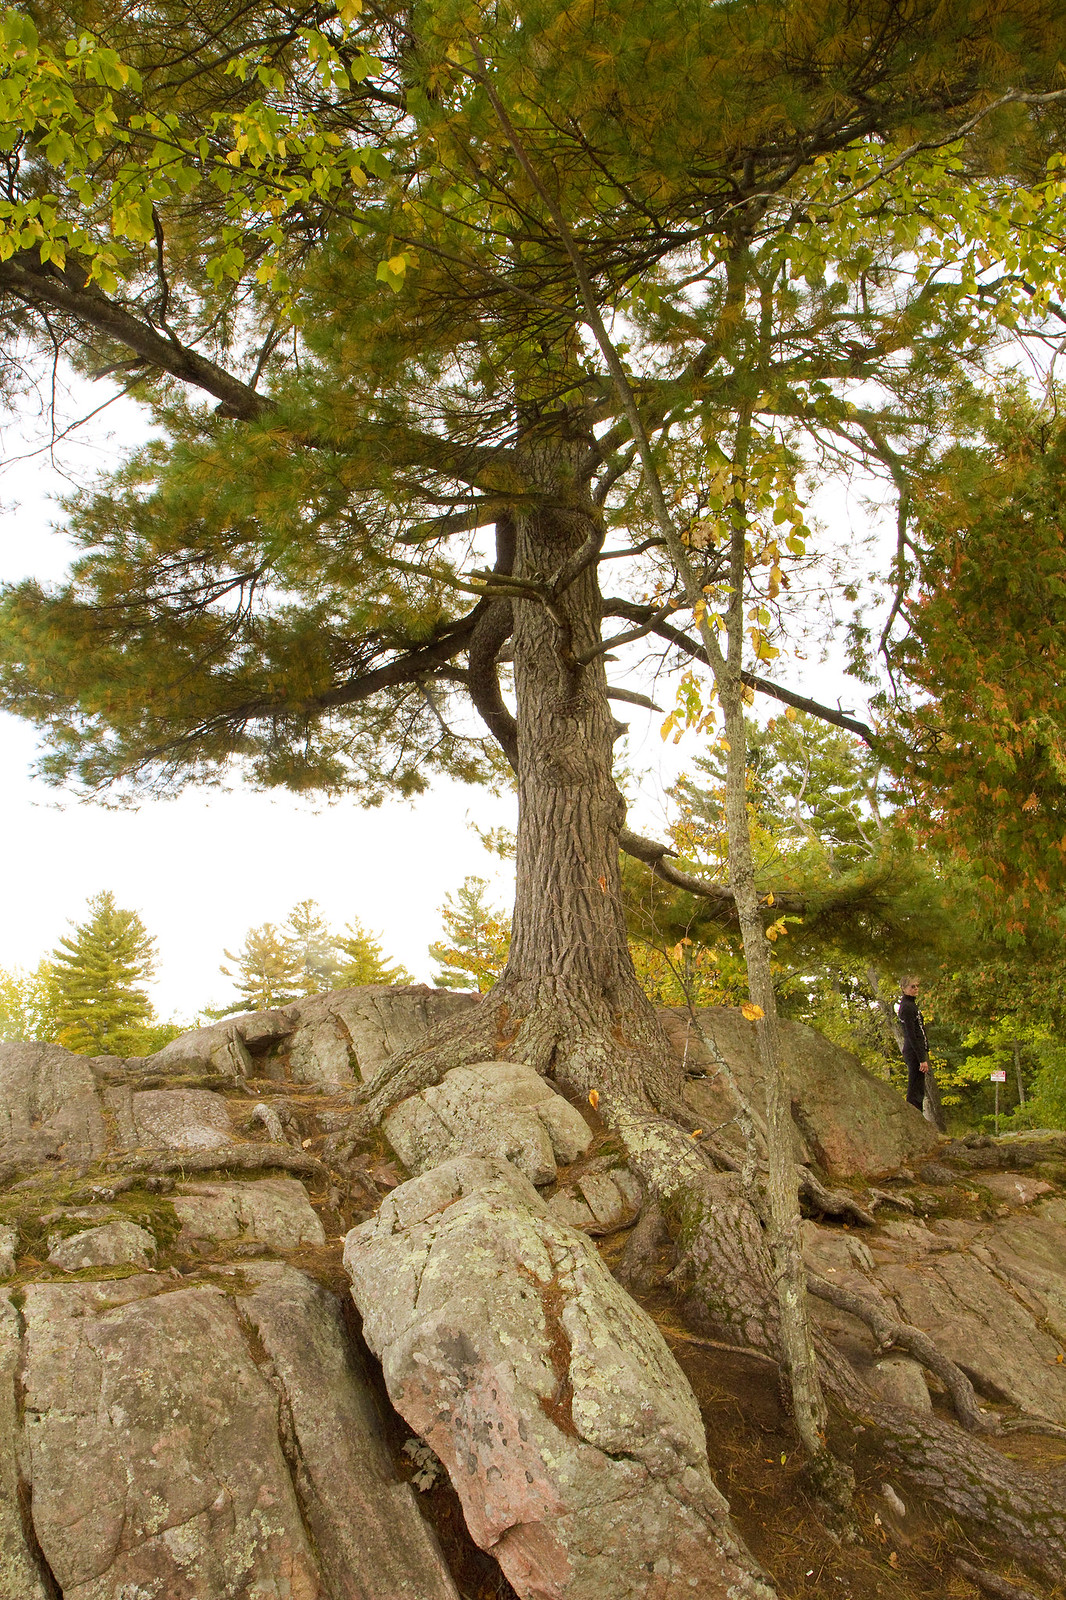 bf rocky tree